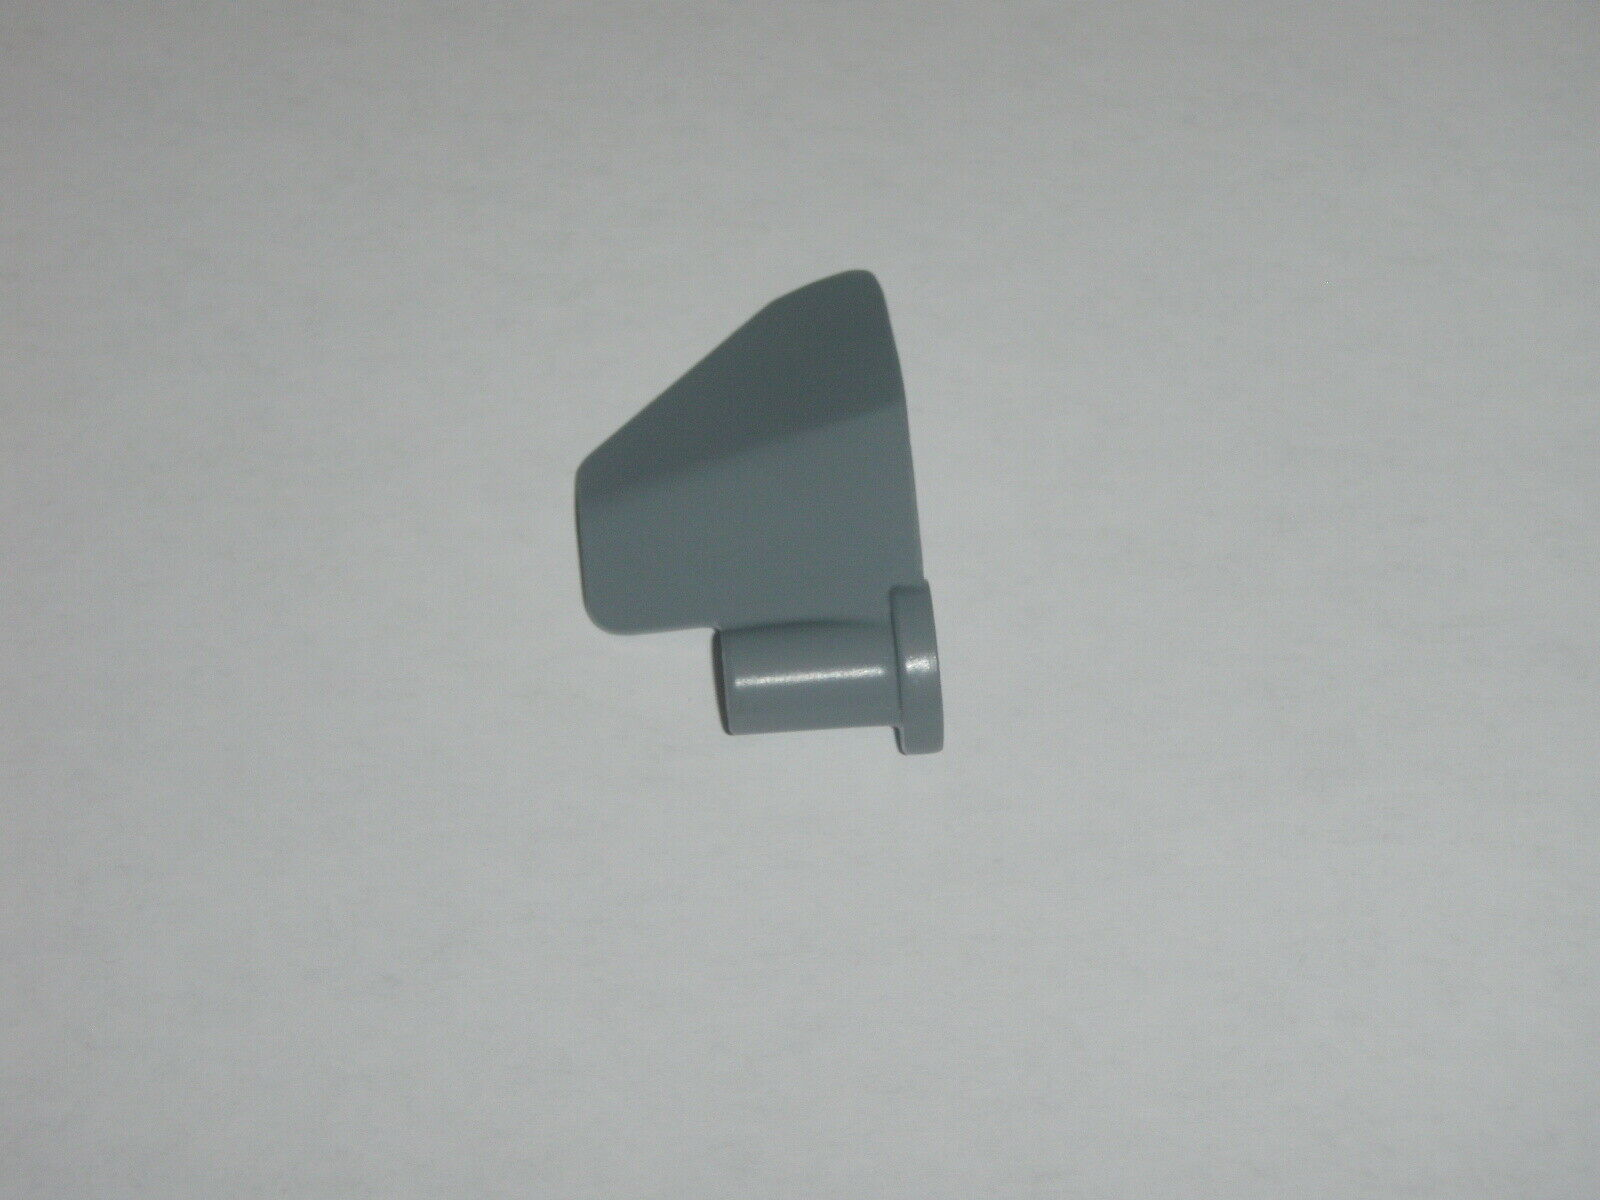 Farberware Bread Maker Machine Original Paddle for Models FTR700 (OEM) FTR700DL image 5